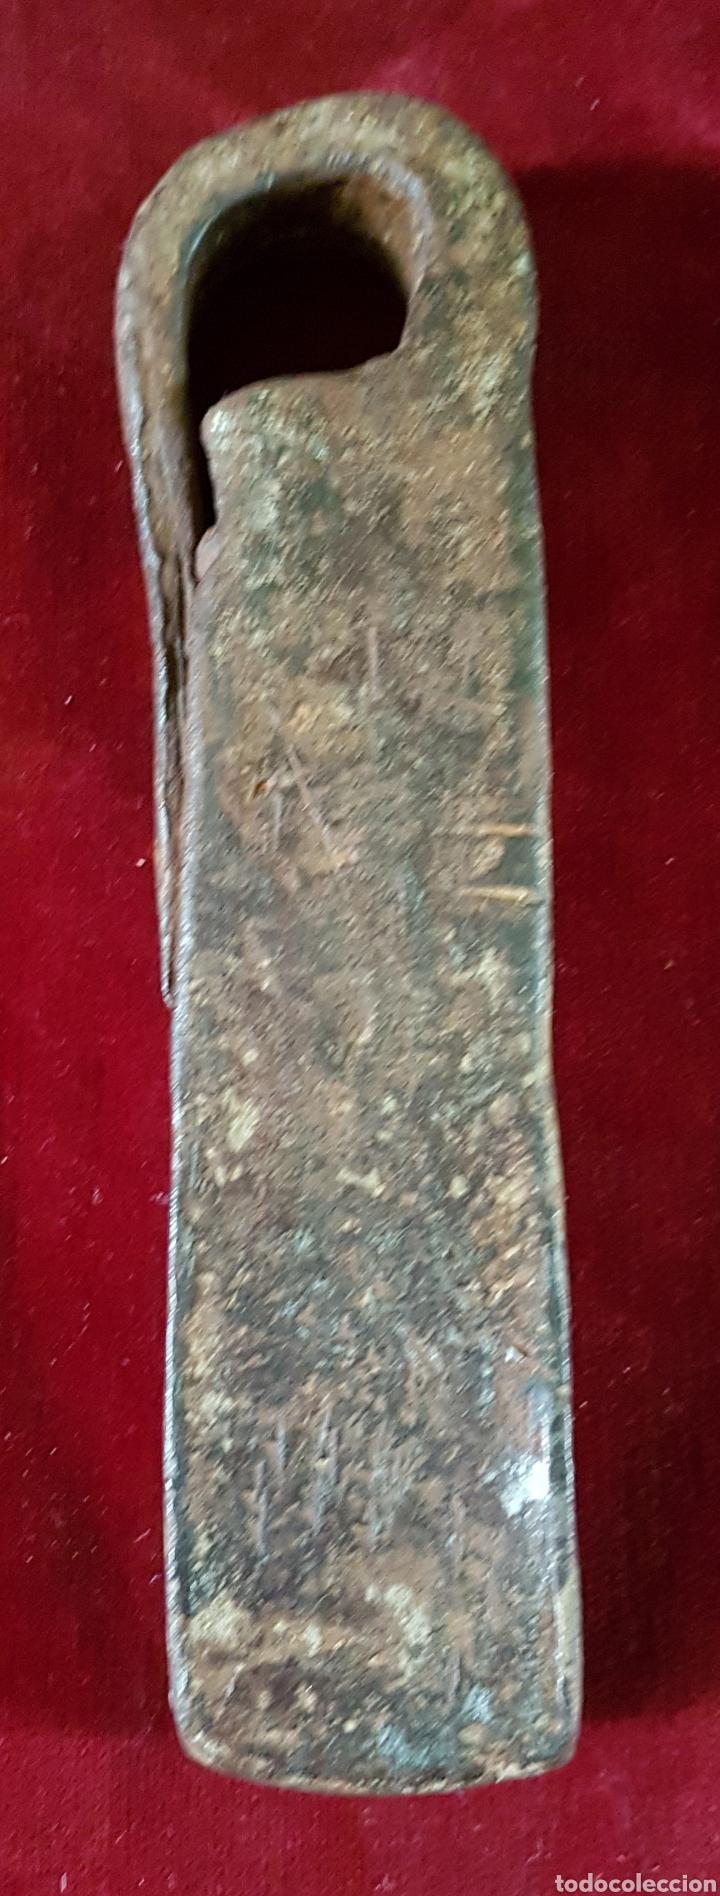 Antigüedades: Antigua gran romana pesa medida hierro forja - Foto 3 - 163033766